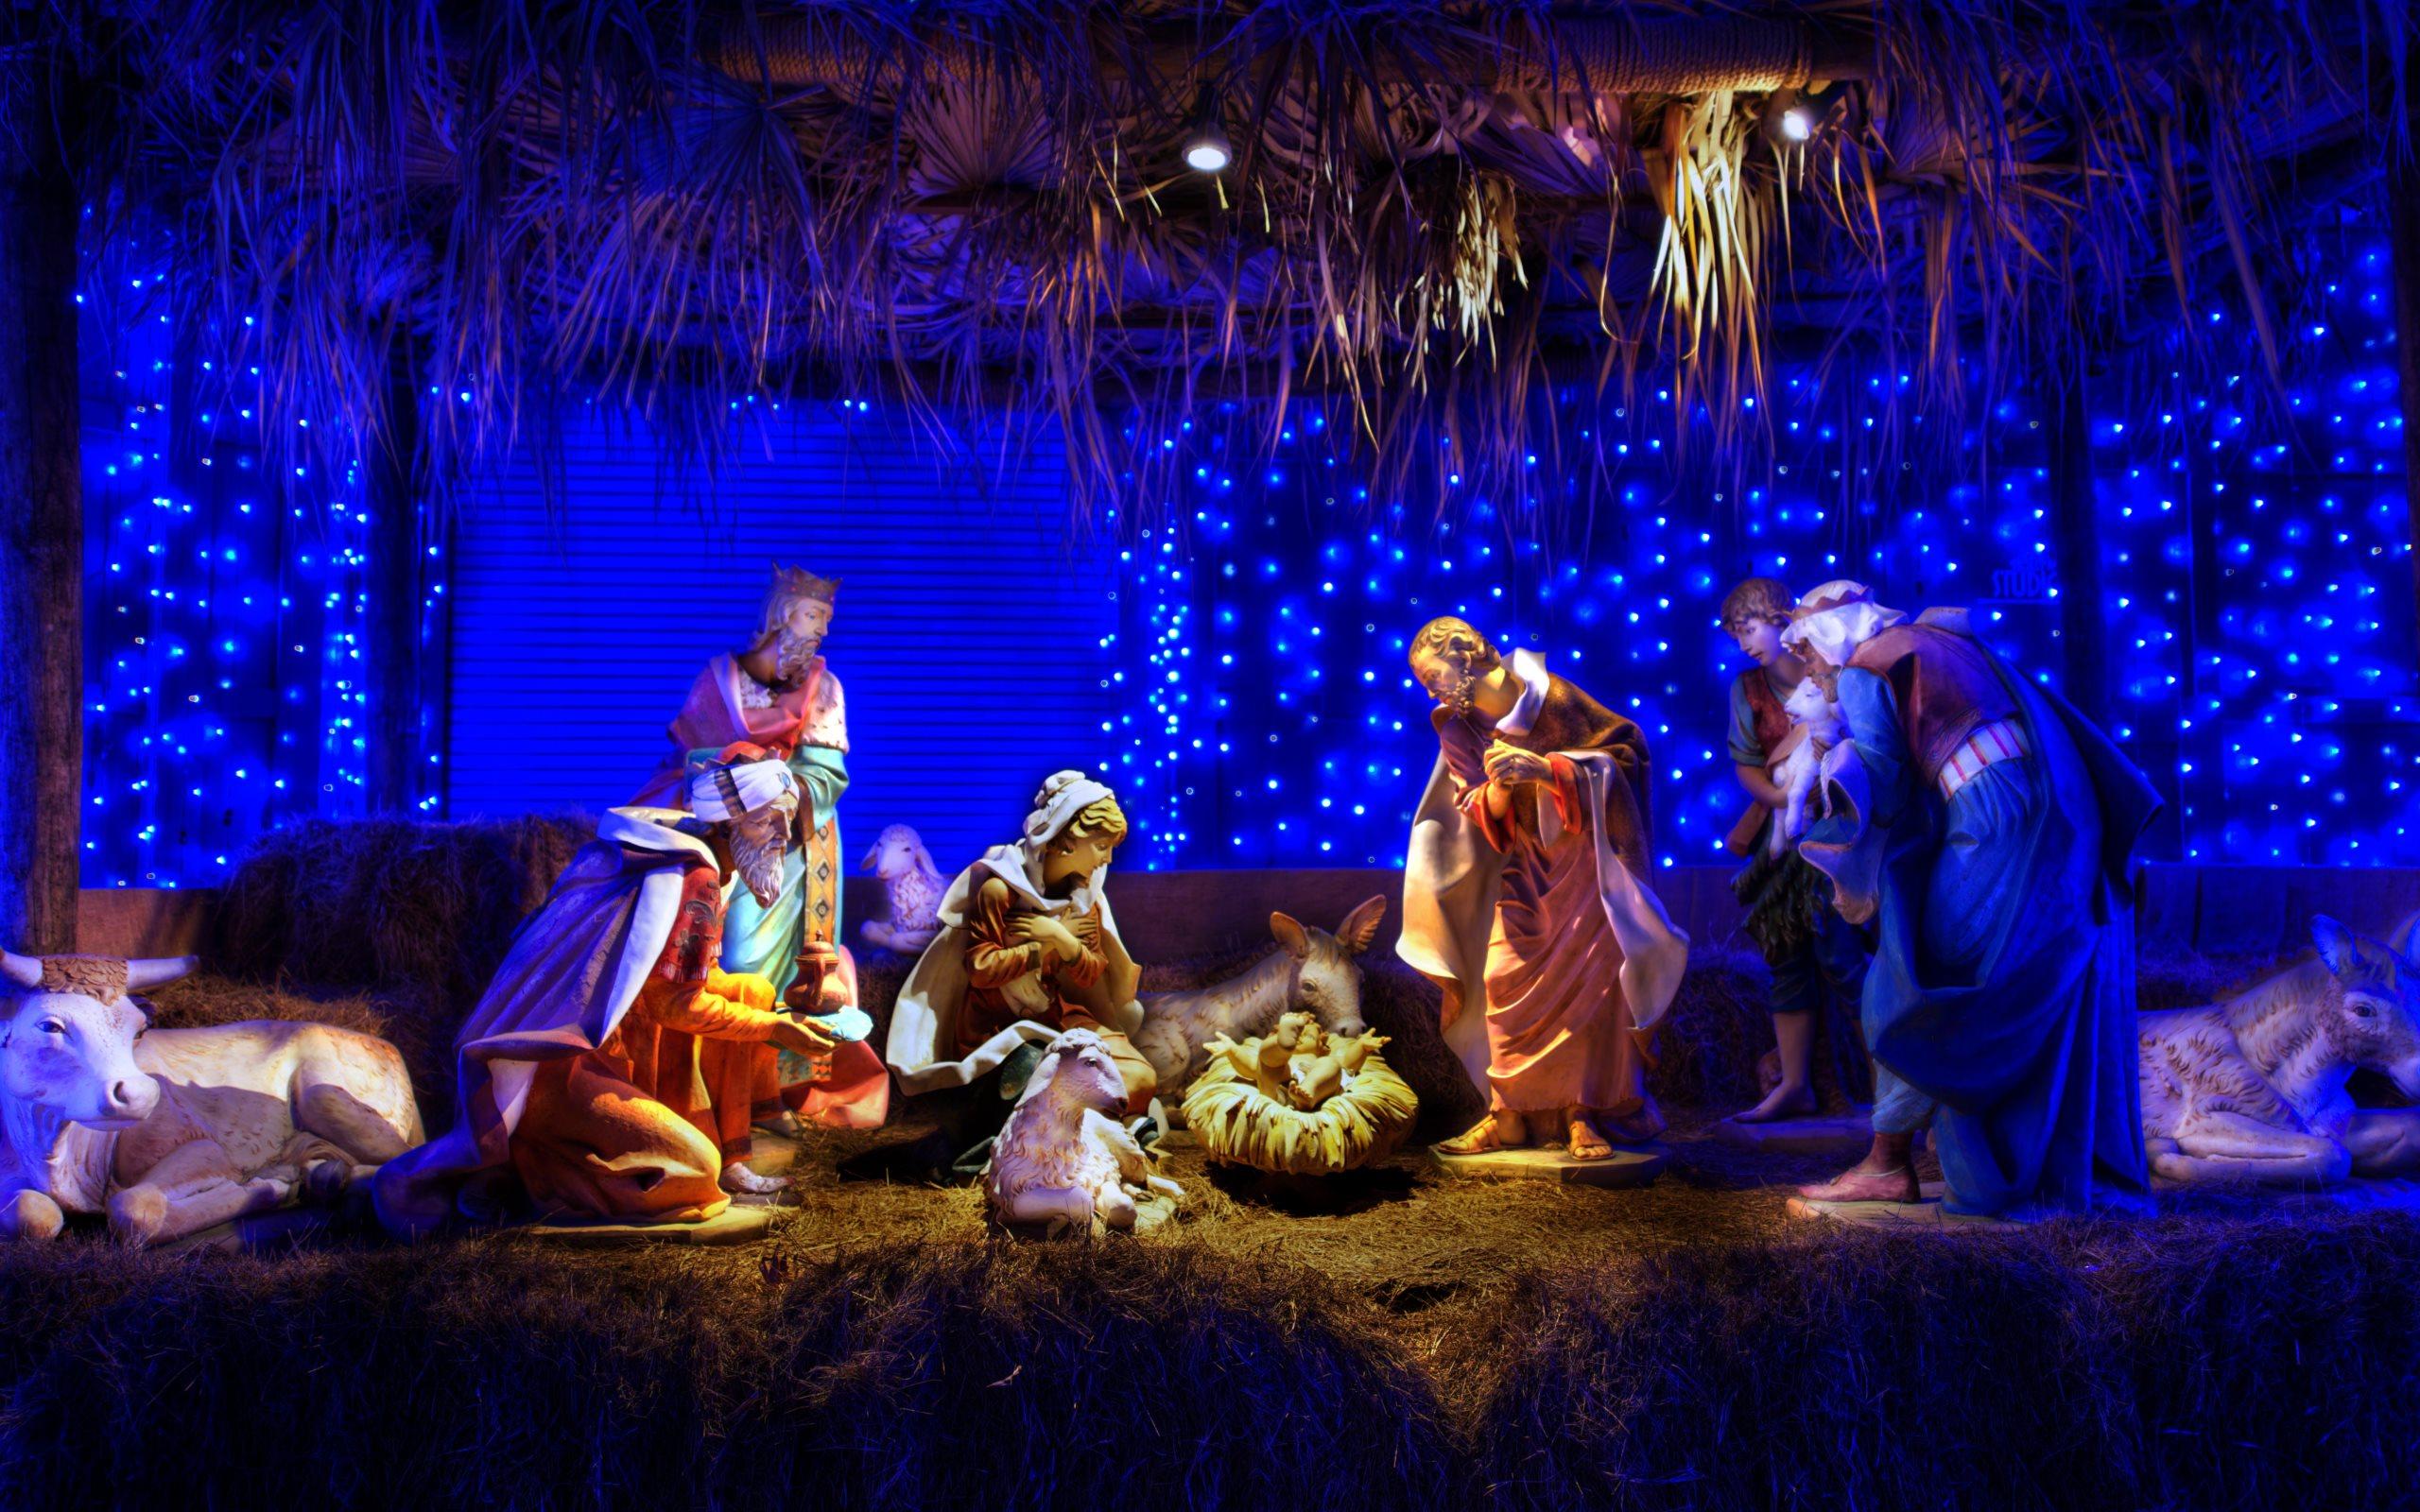 Christmas Nativity Scene Wallpapers | Free Computer Desktop Wallpapers